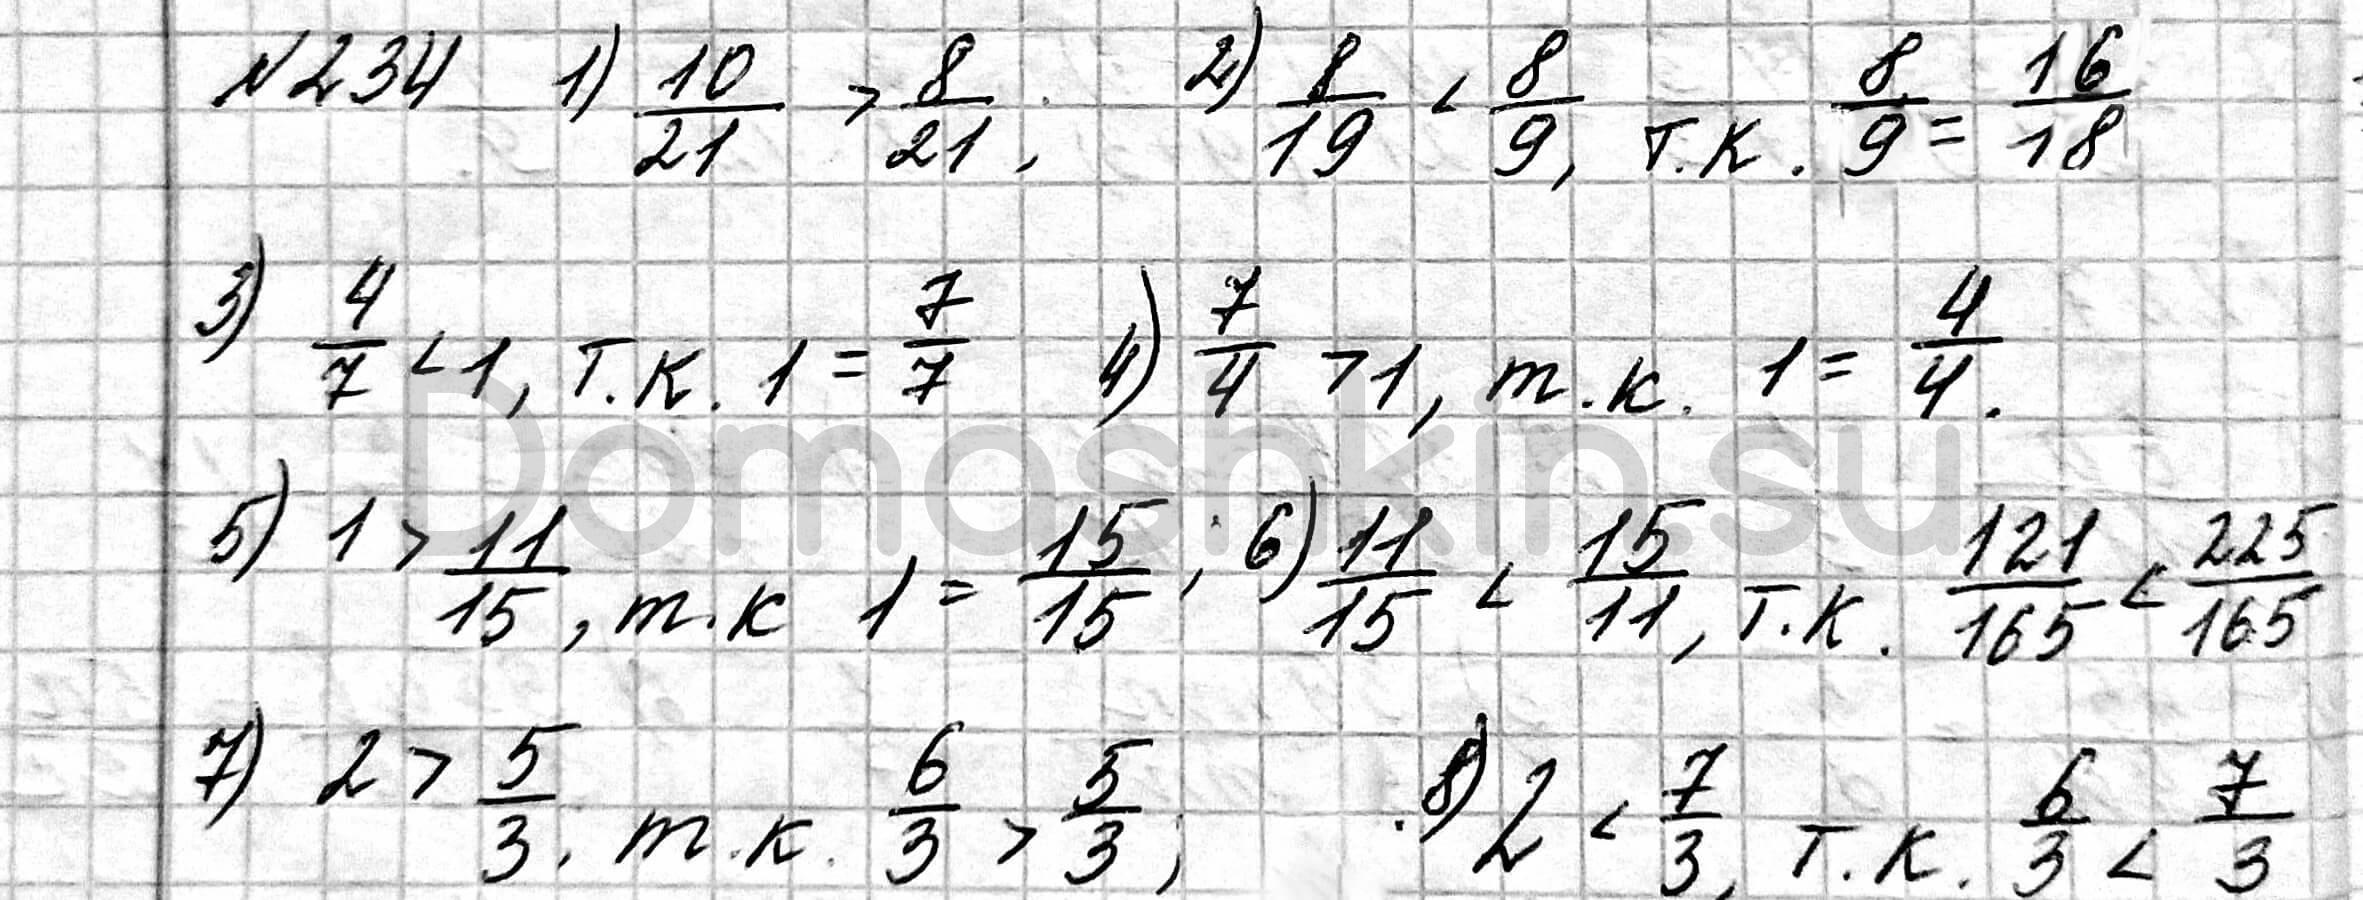 Математика 6 класс учебник Мерзляк номер 234 решение